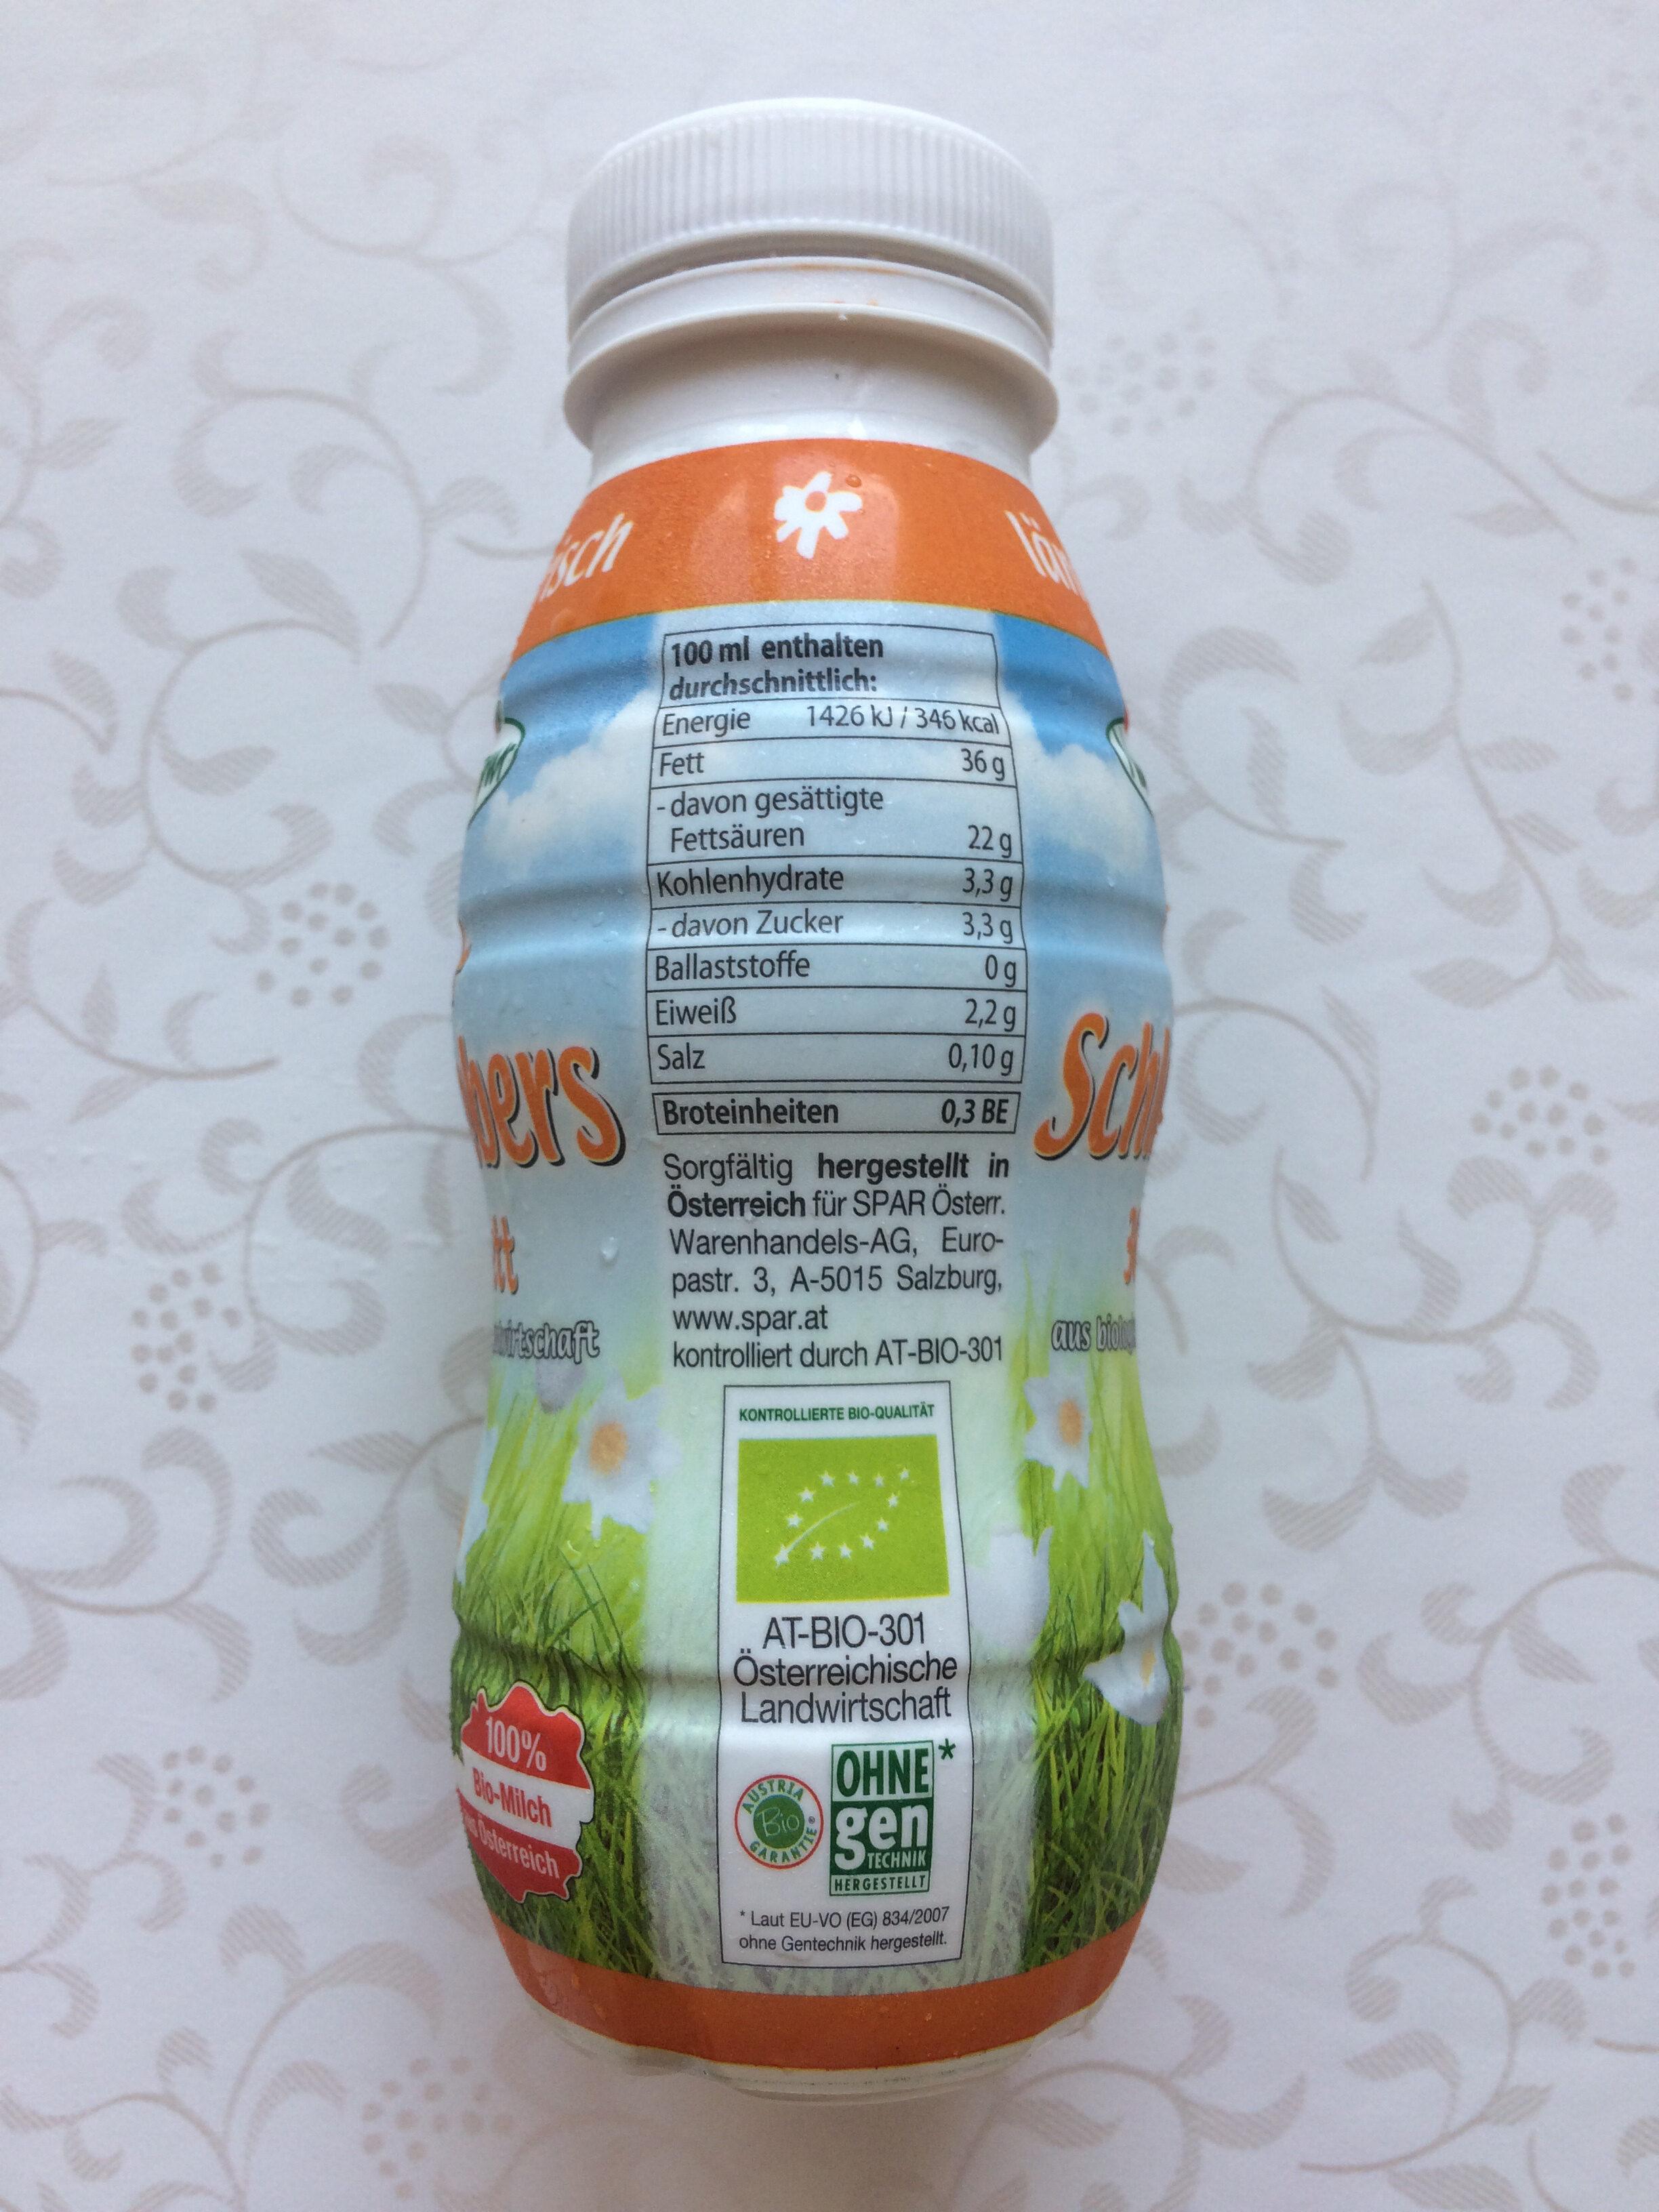 Bio-Schlagobers 36% Fett - Nutrition facts - de